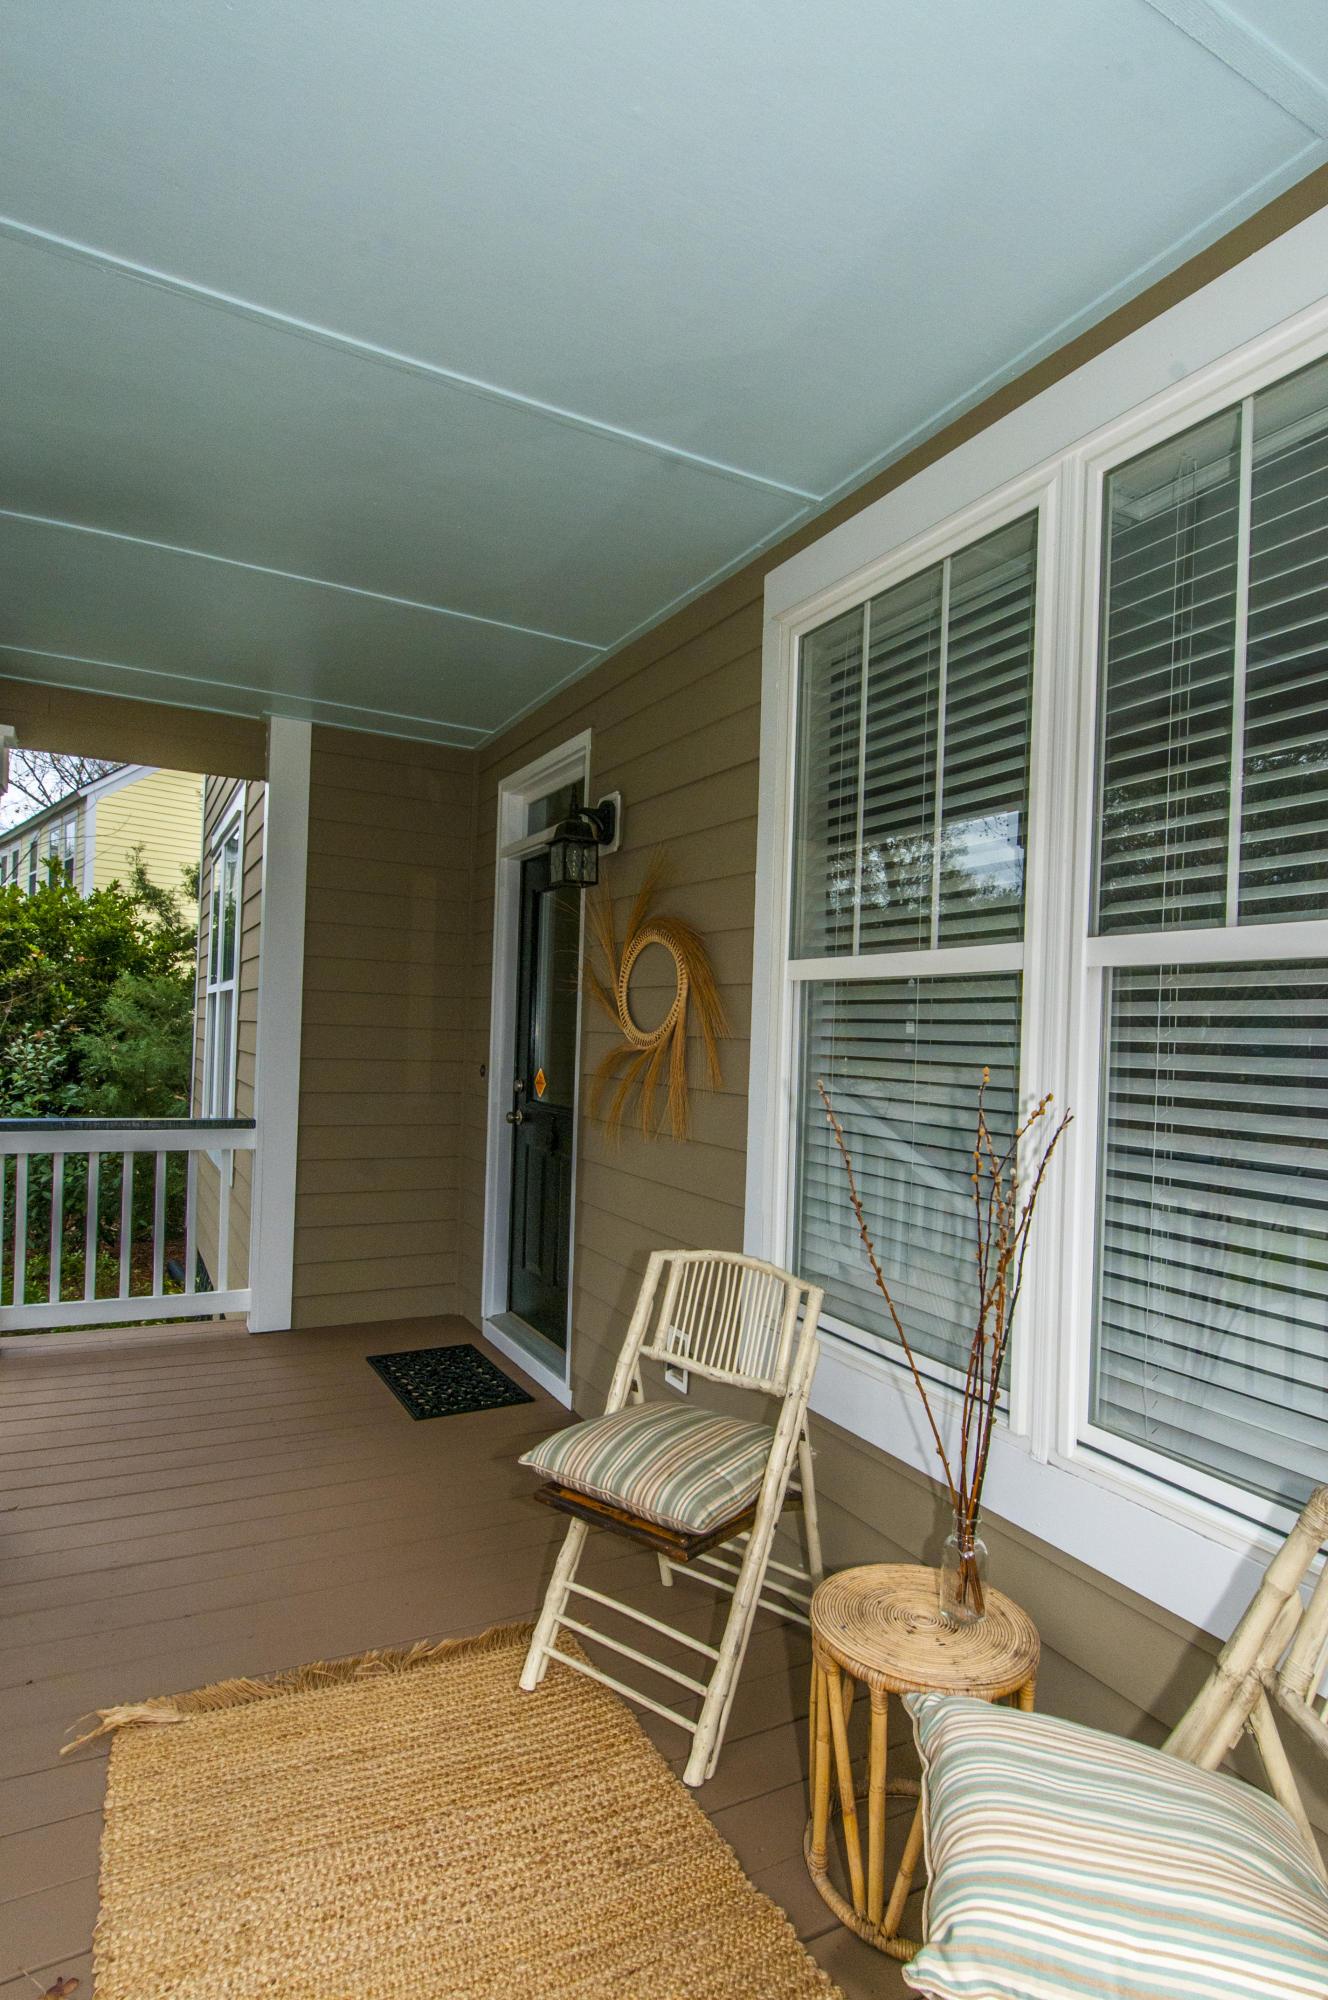 Etiwan Park Homes For Sale - 115 Brady, Daniel Island, SC - 24